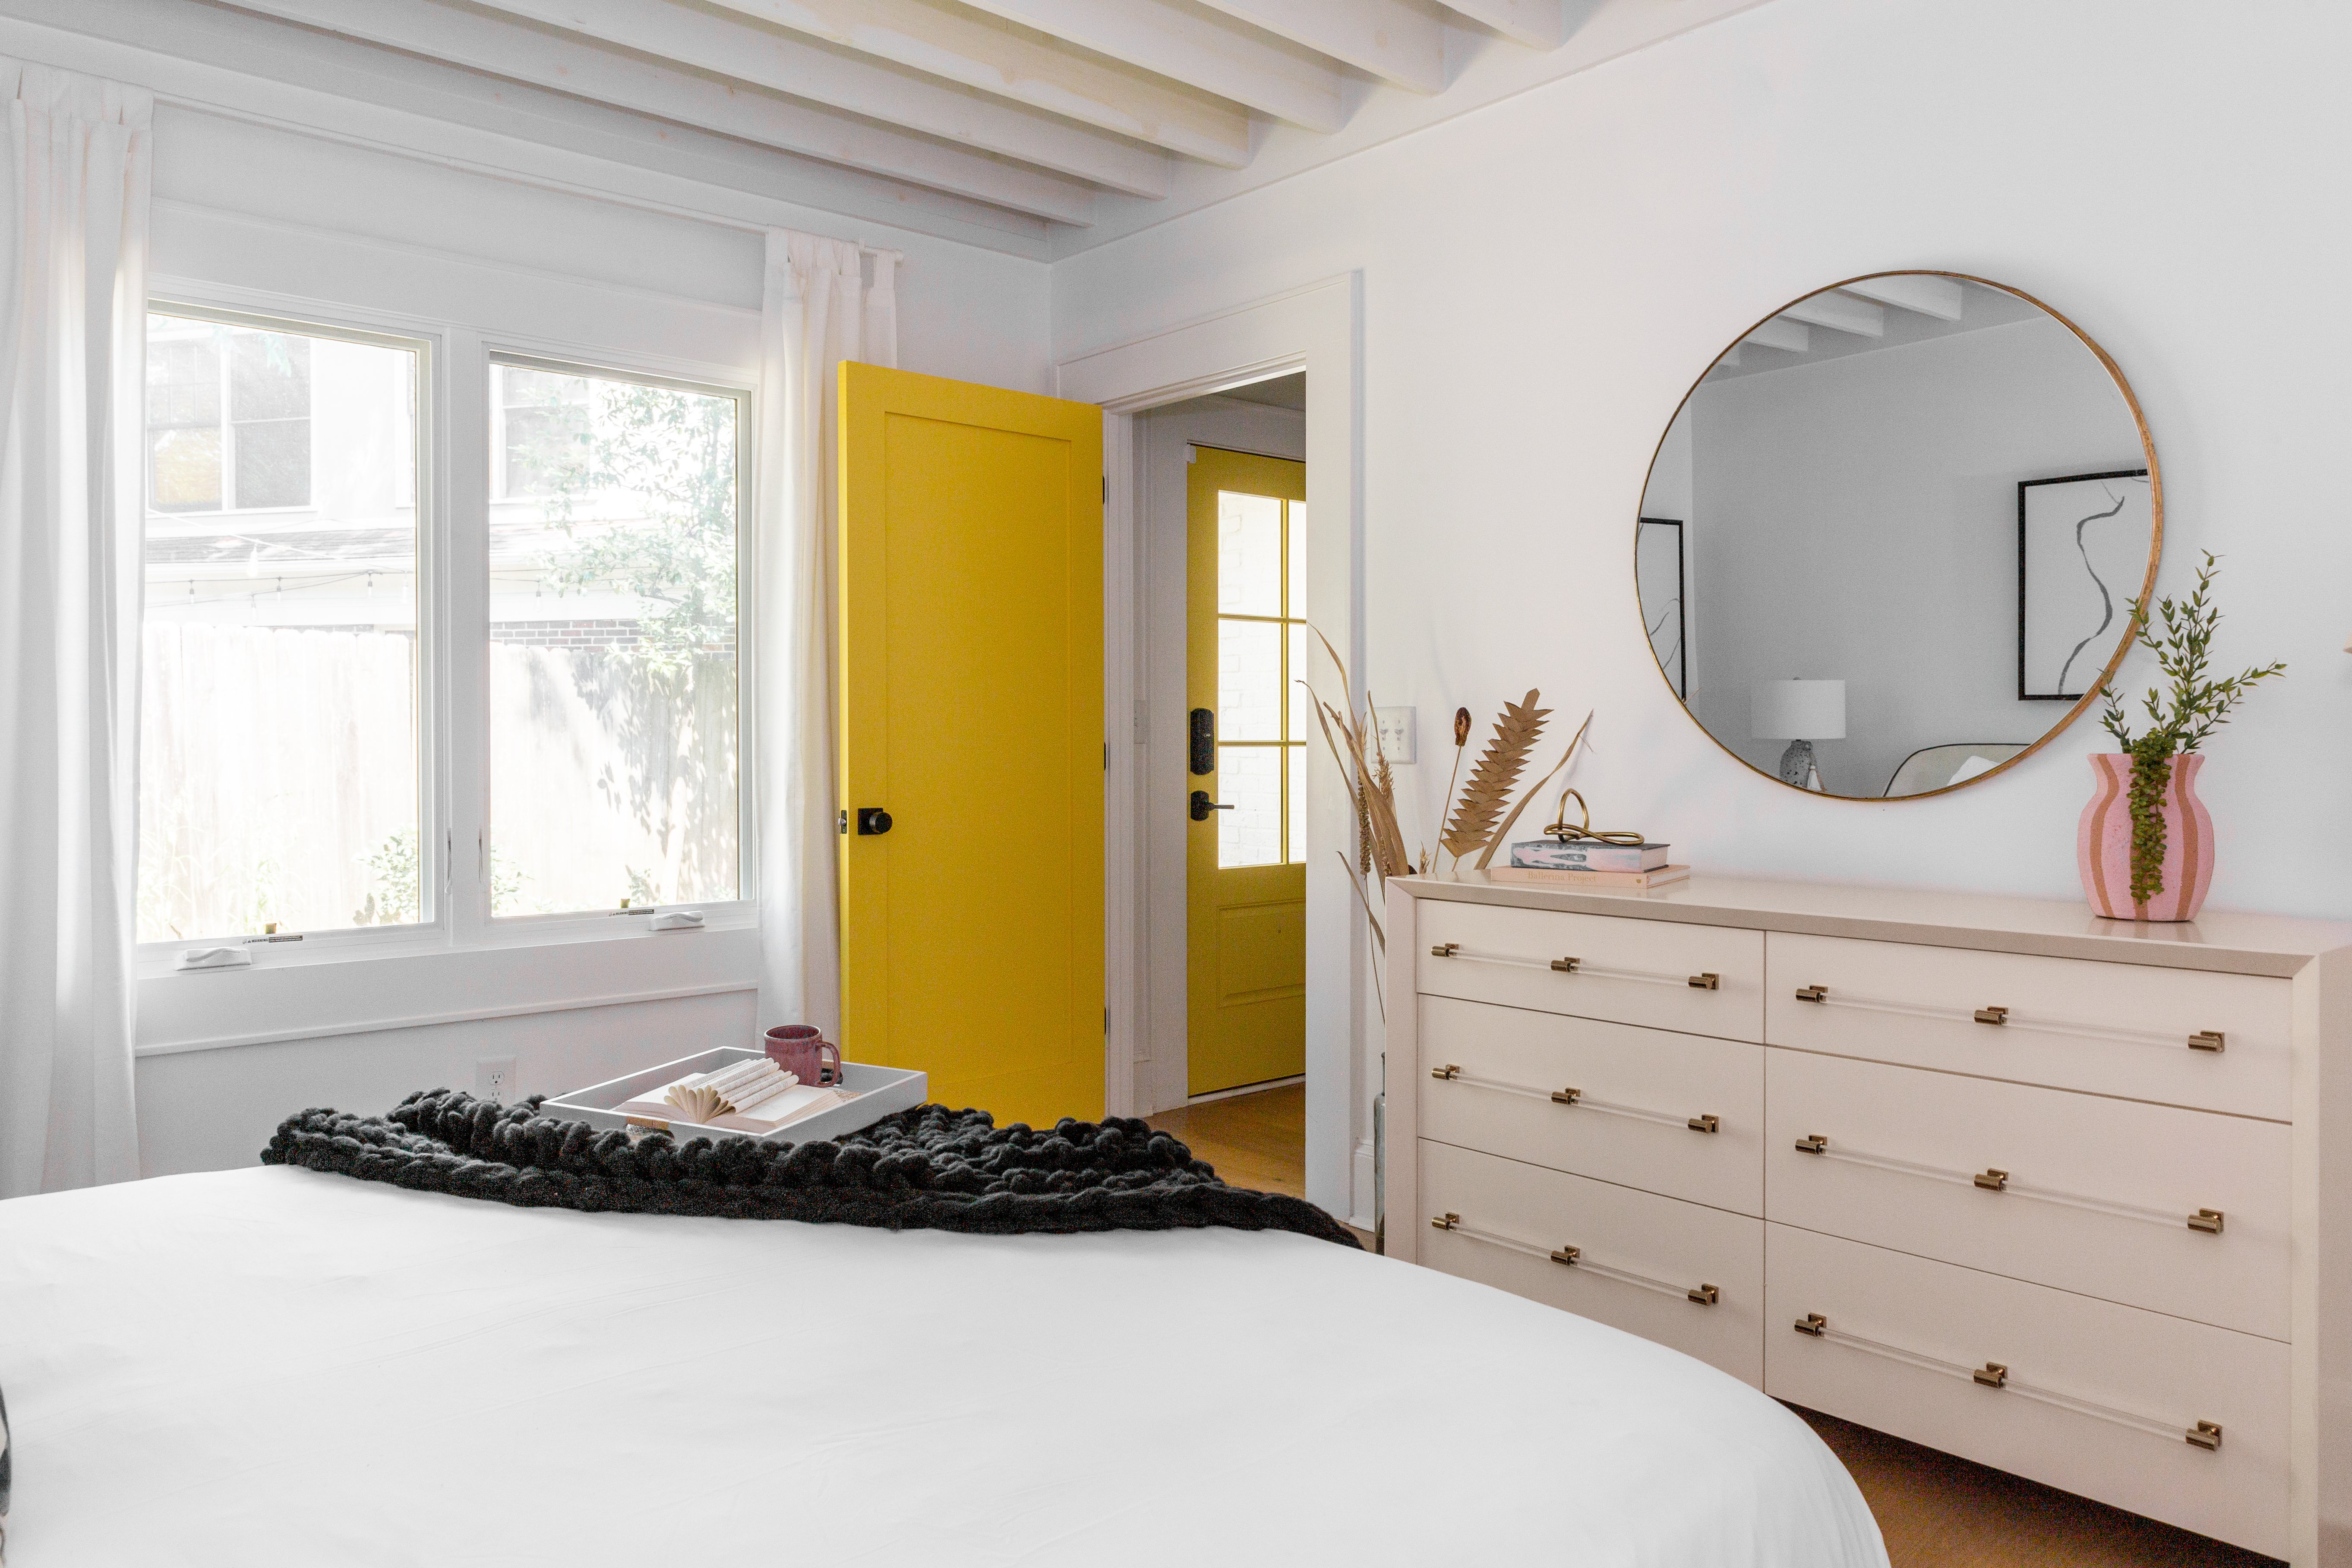 05 master bedroom 20210721-IMG_0096-HDR.jpg